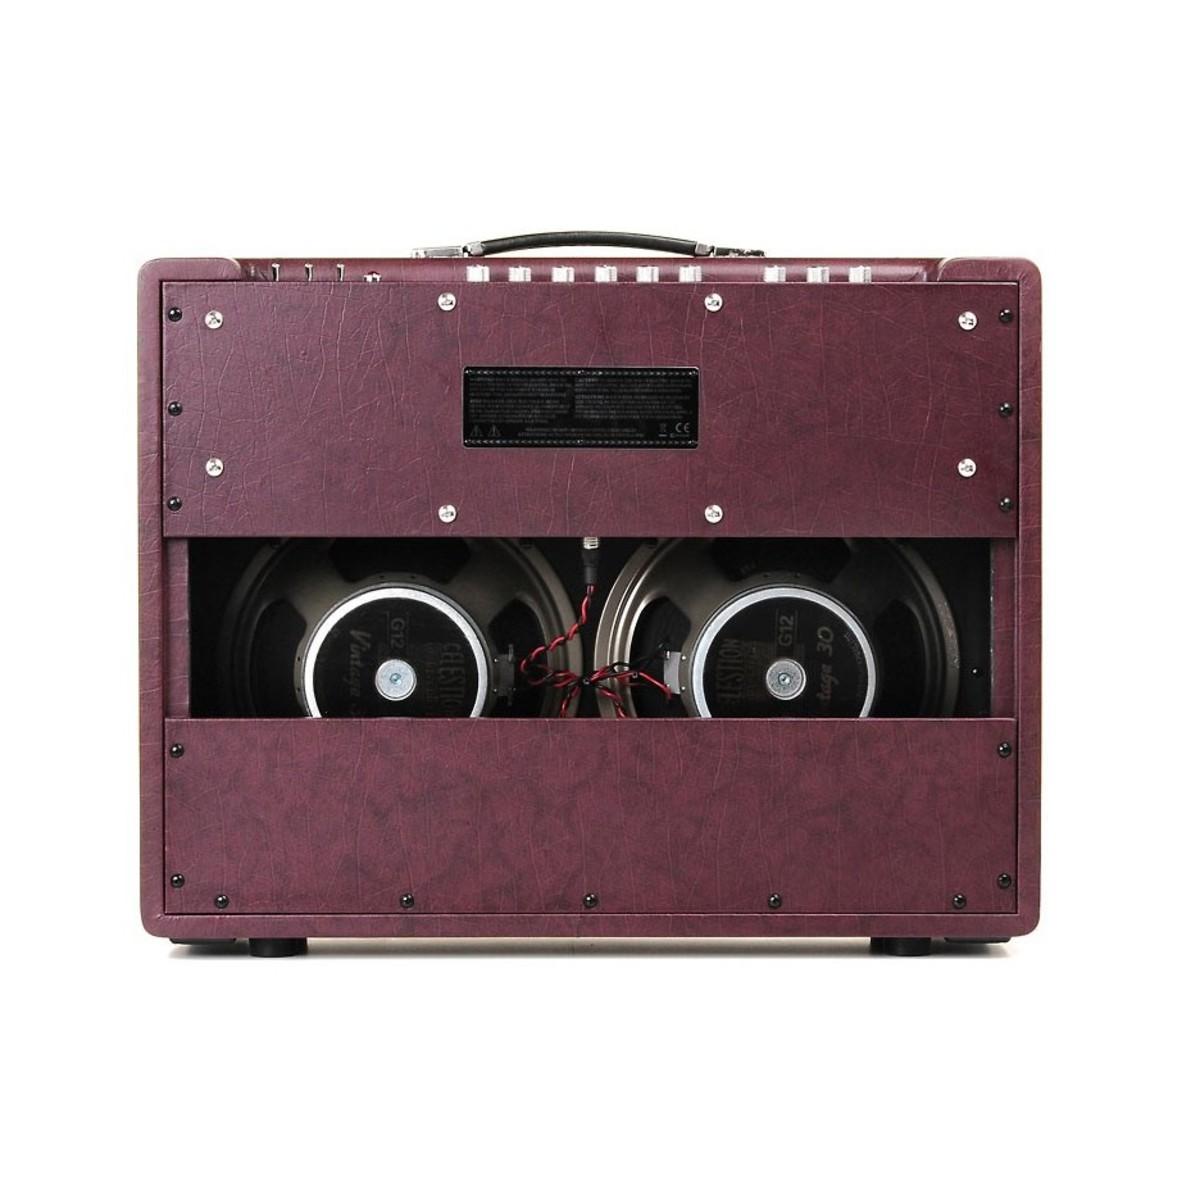 blackstar artisan 30 30w 2 x 12 handwired combo at gear4music. Black Bedroom Furniture Sets. Home Design Ideas